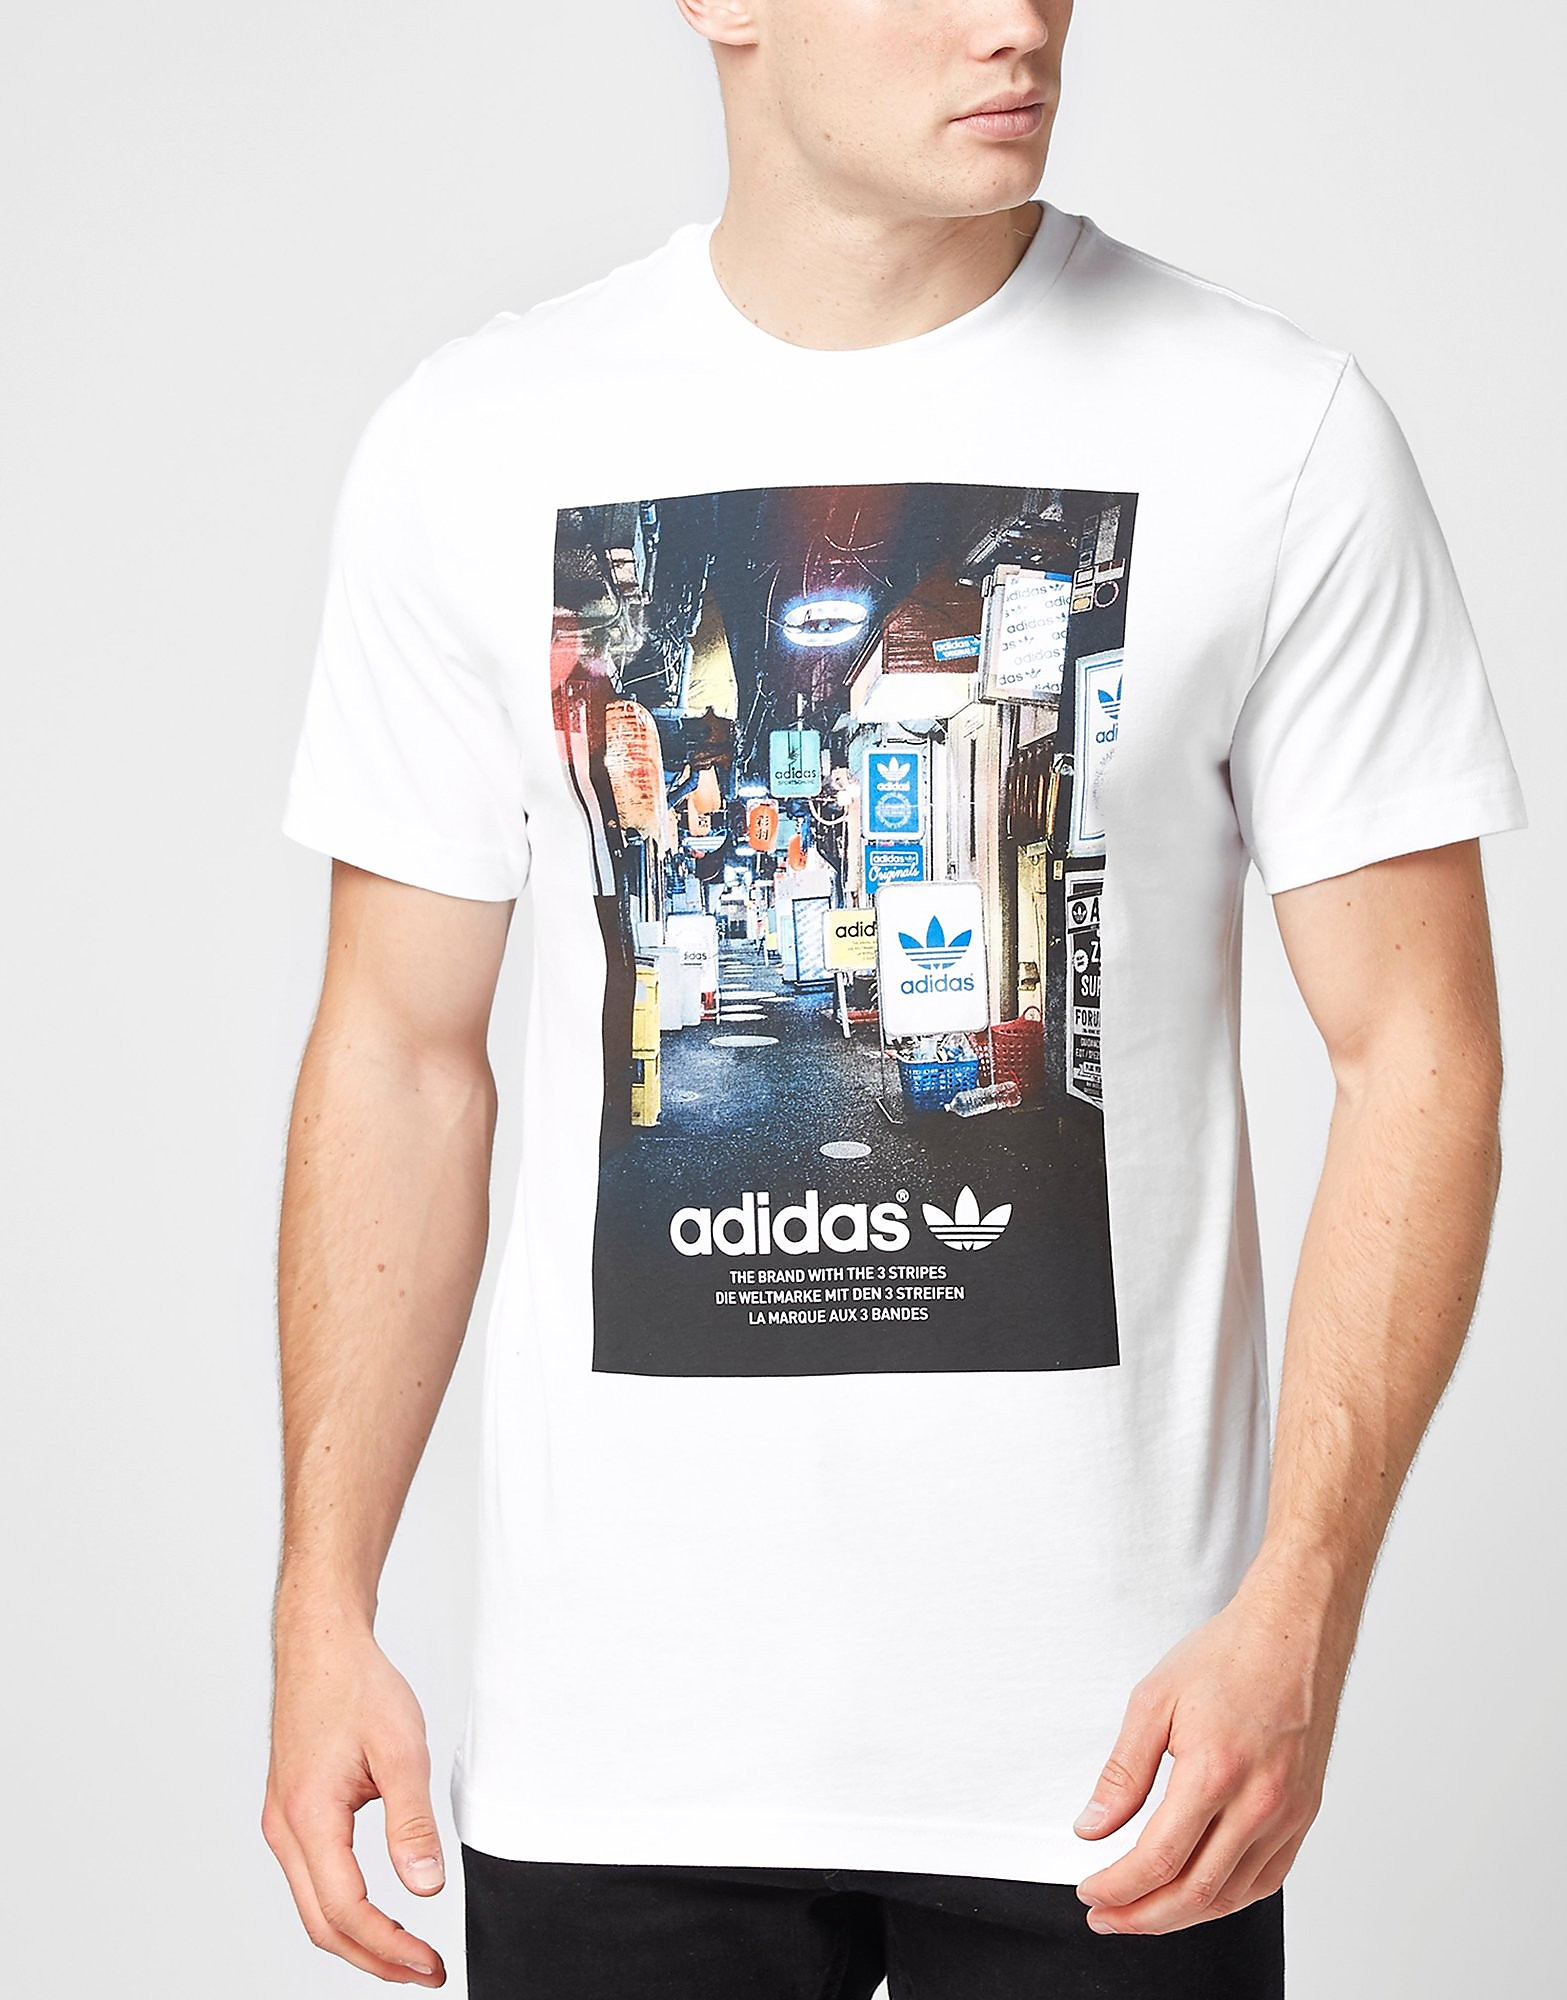 adidas Originals Street Photo T-Shirt